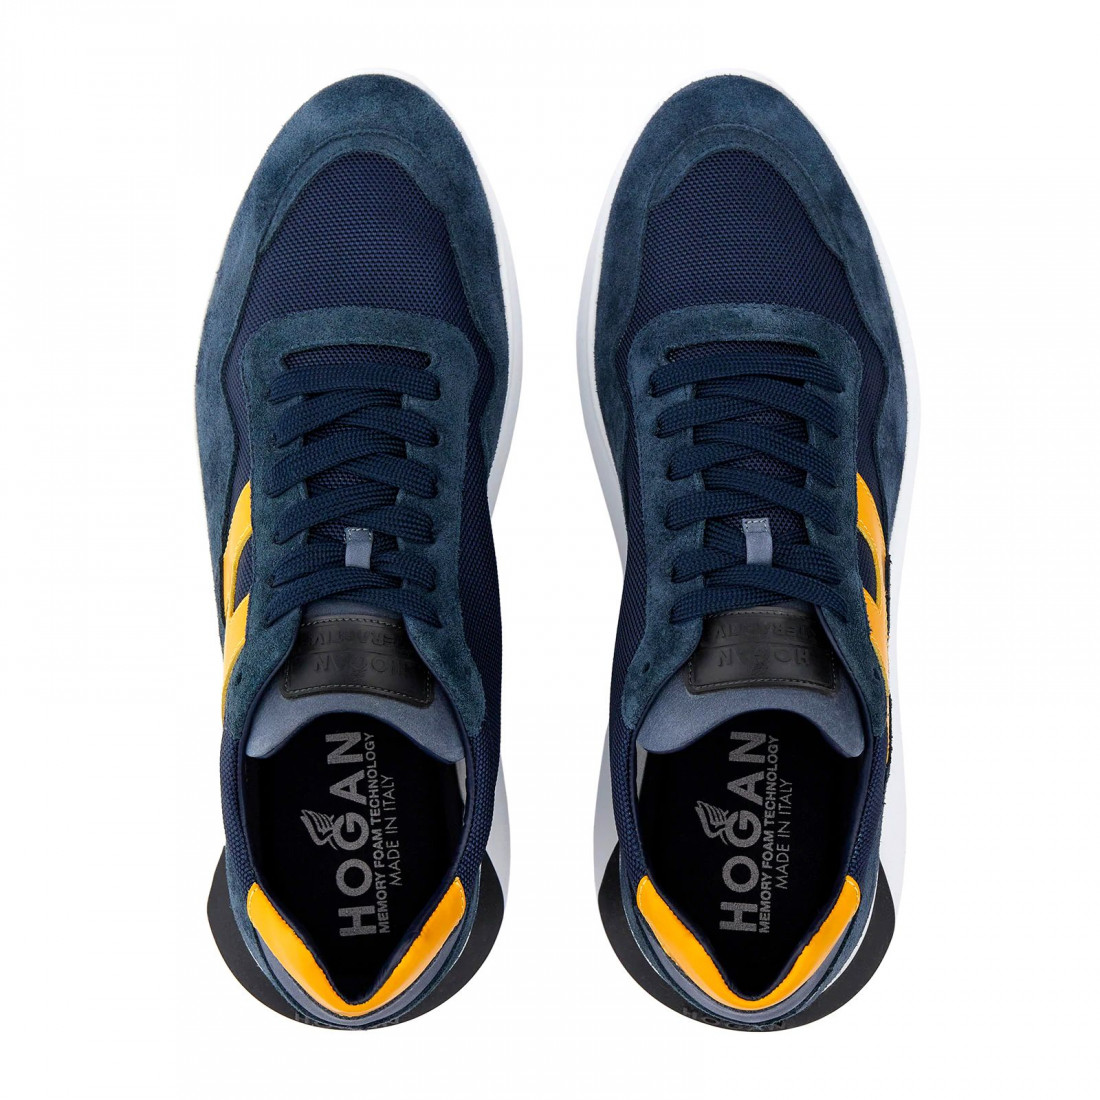 sneakers uomo hogan hxm3710aj18pdk51af 8220